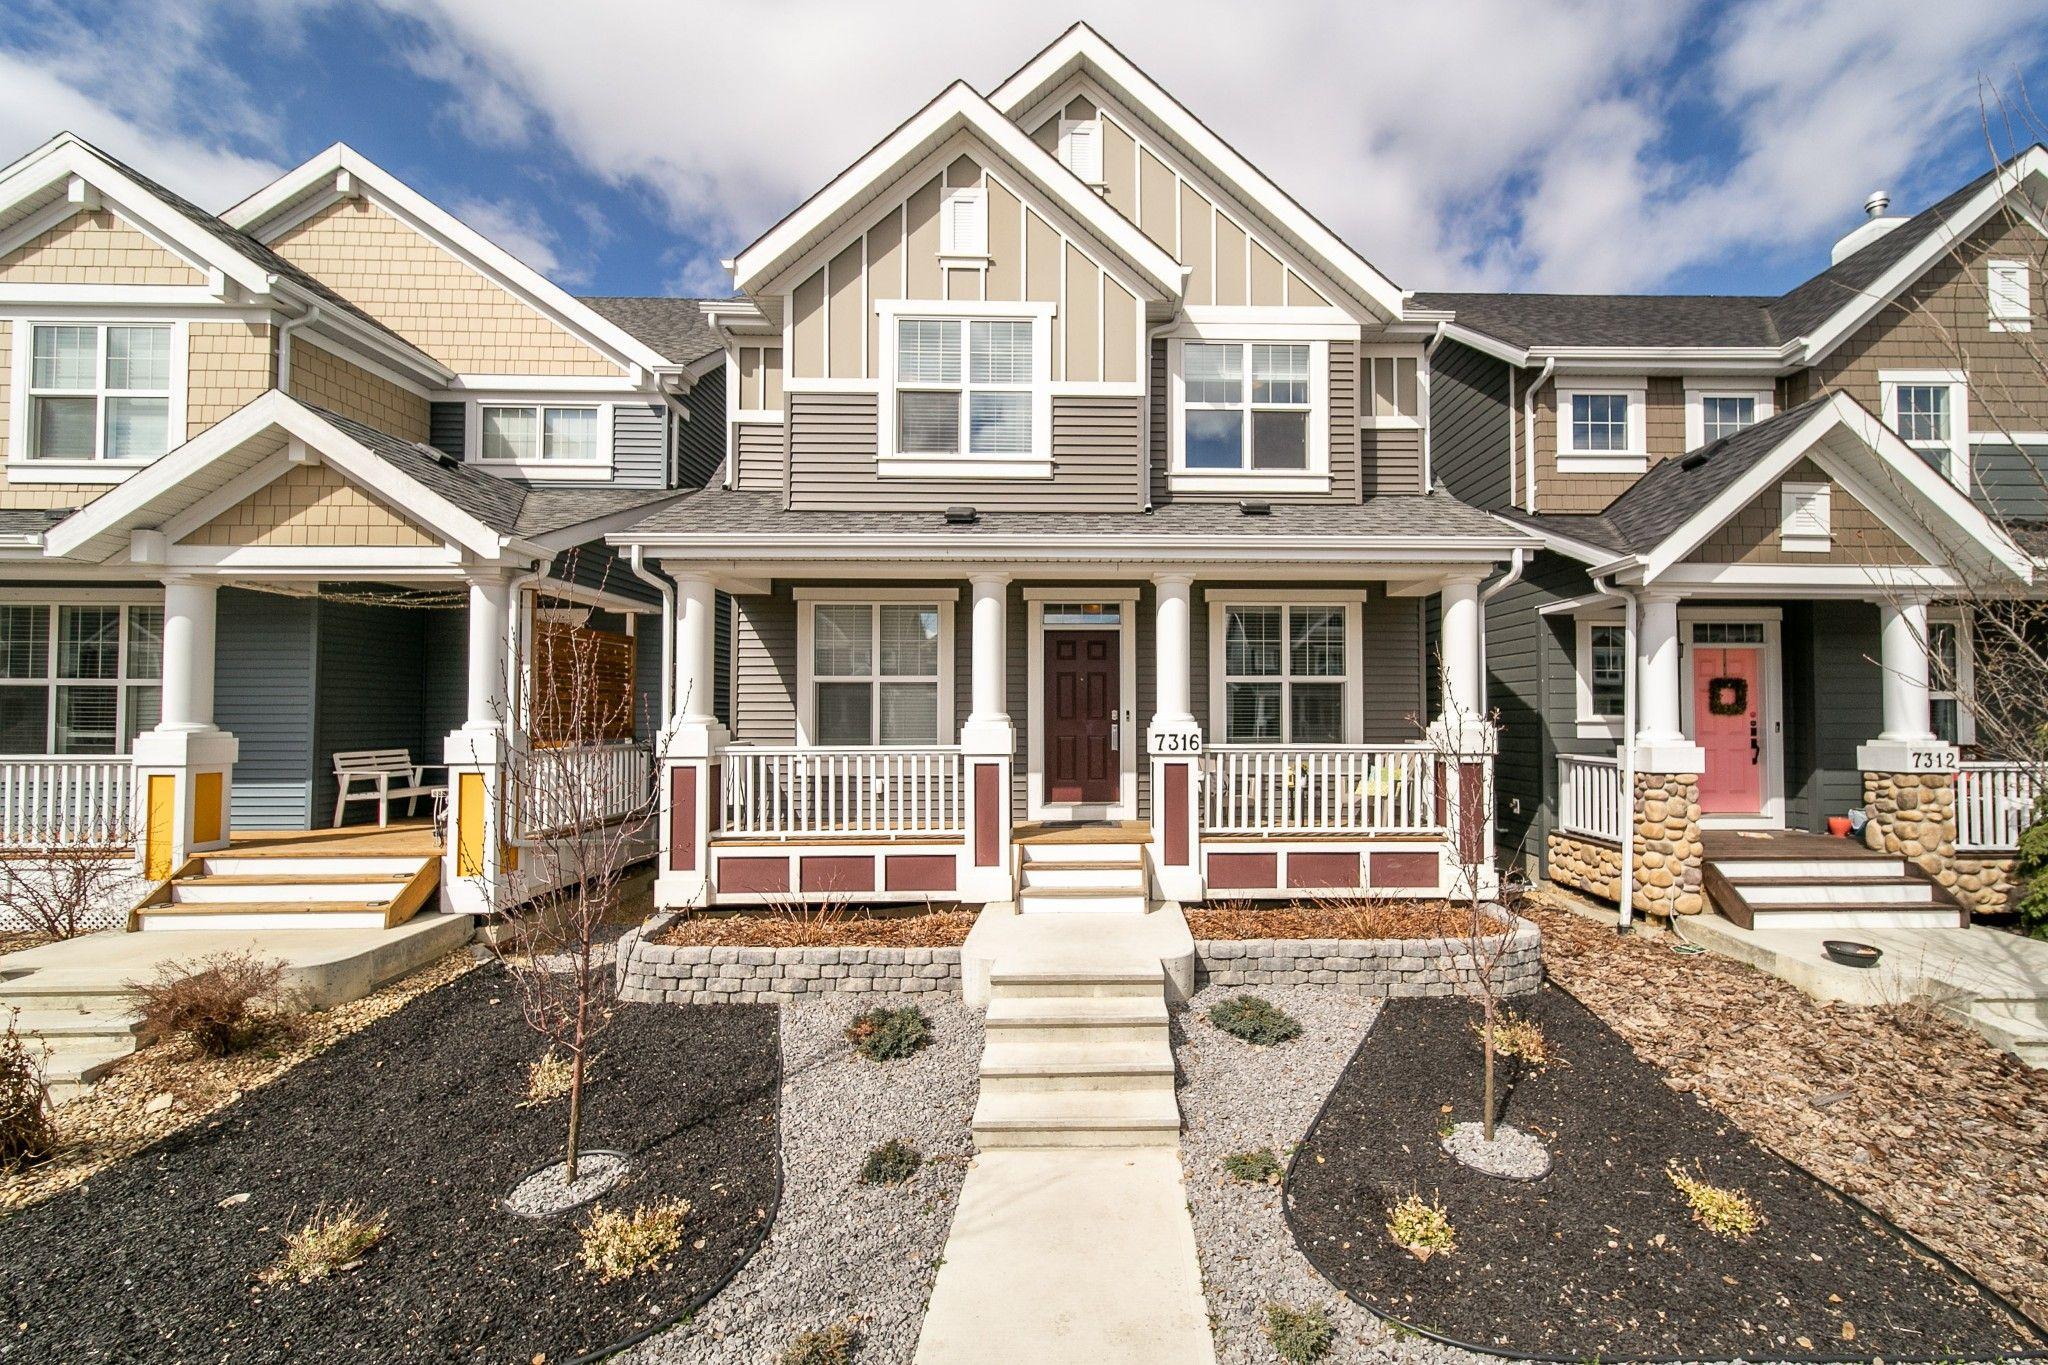 Main Photo: 7316 Summerside Grande Boulevard Boulevard NW in Edmonton: summerside House for sale : MLS®# E4240191